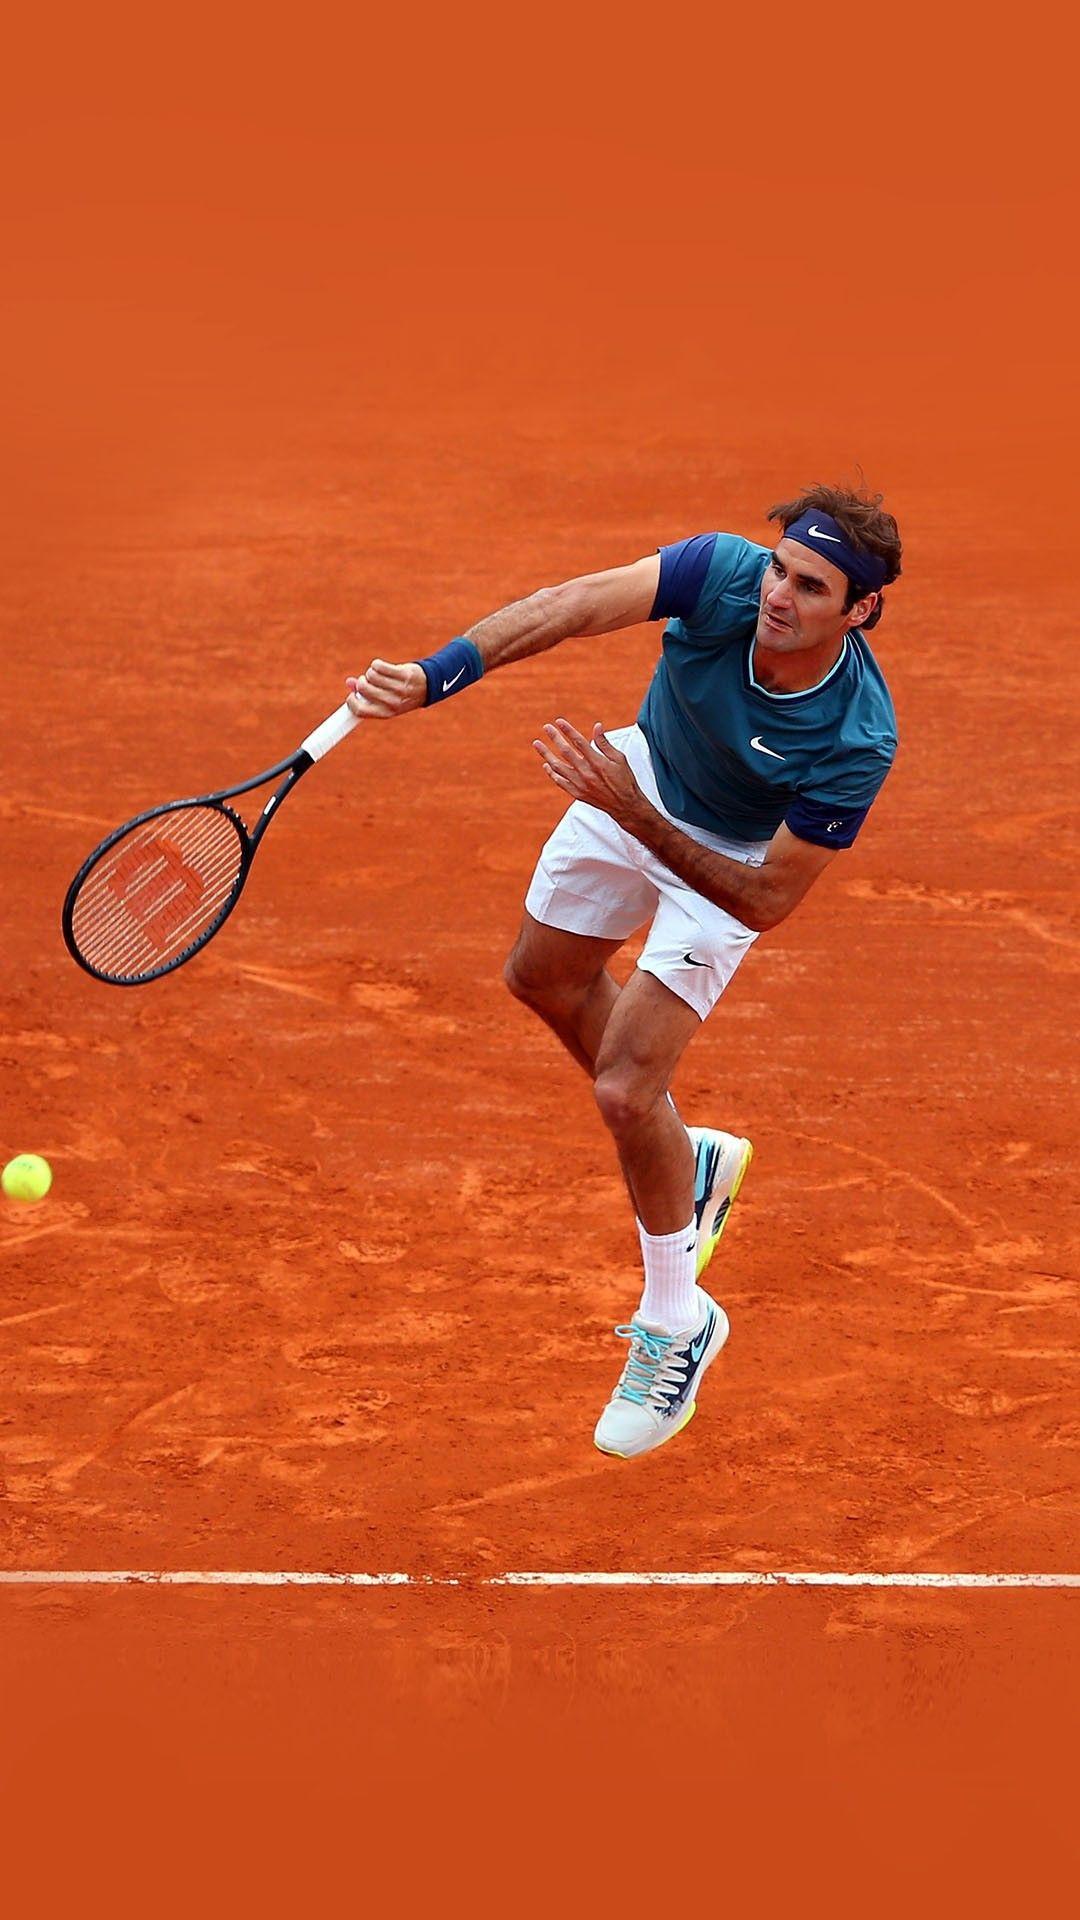 Roger Federer Tennis Player Smartphone Wallpaper And Lockscreen Hd Check More At Https Phonewallp Com Roger Federer Ten Tennis Wallpaper Roger Federer Tennis